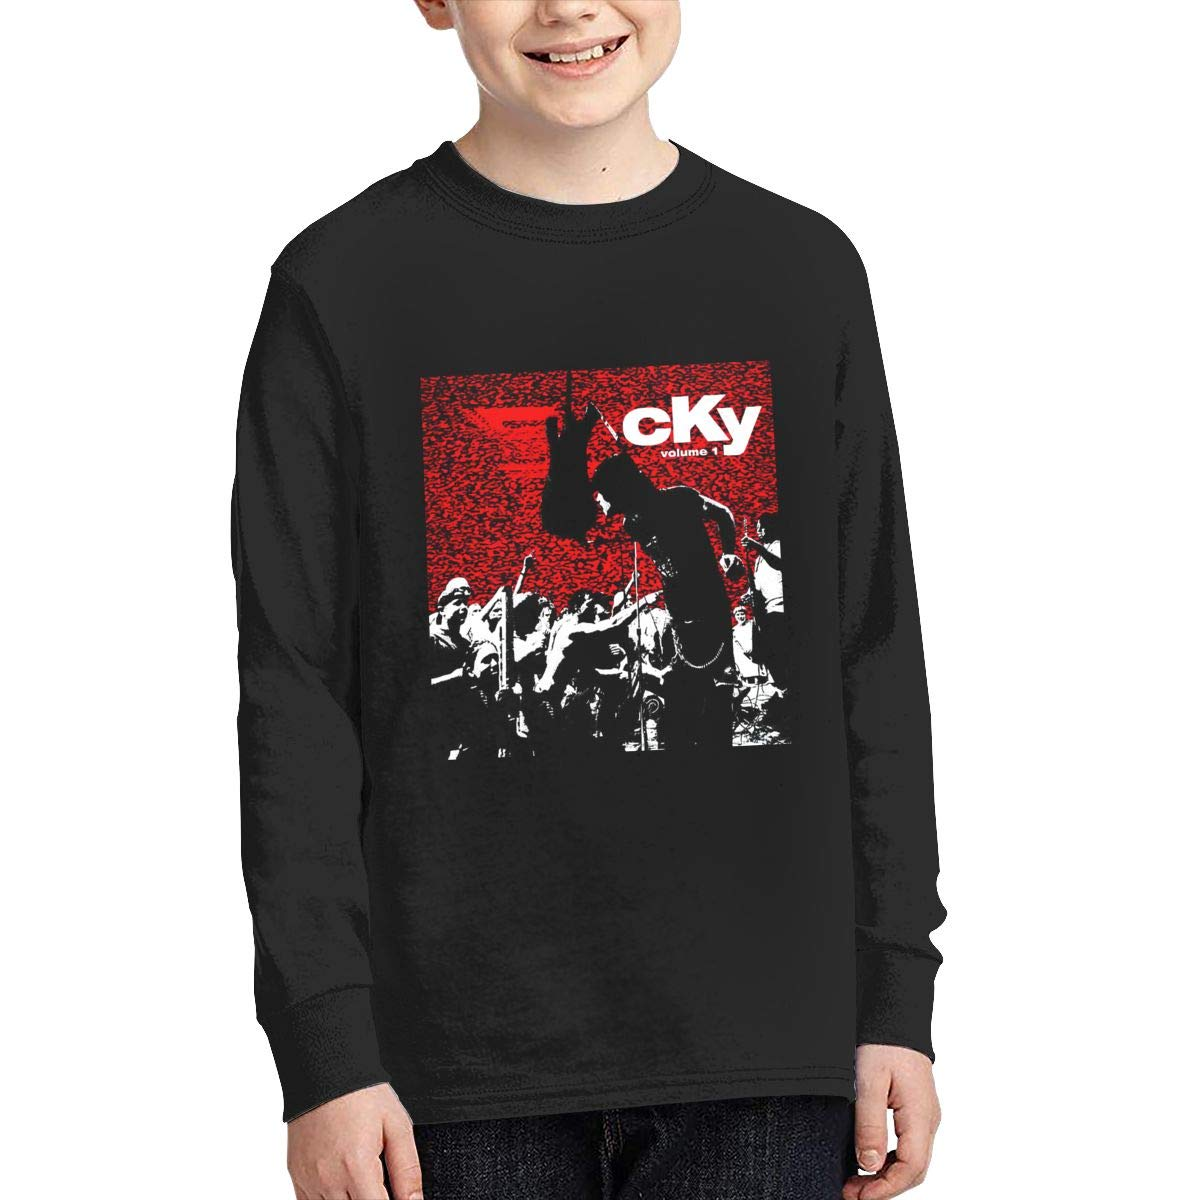 HangHisi CKY5 Boys /& Girls O Neck Regular Style Tee Long Sleeve T Shirt Leisure